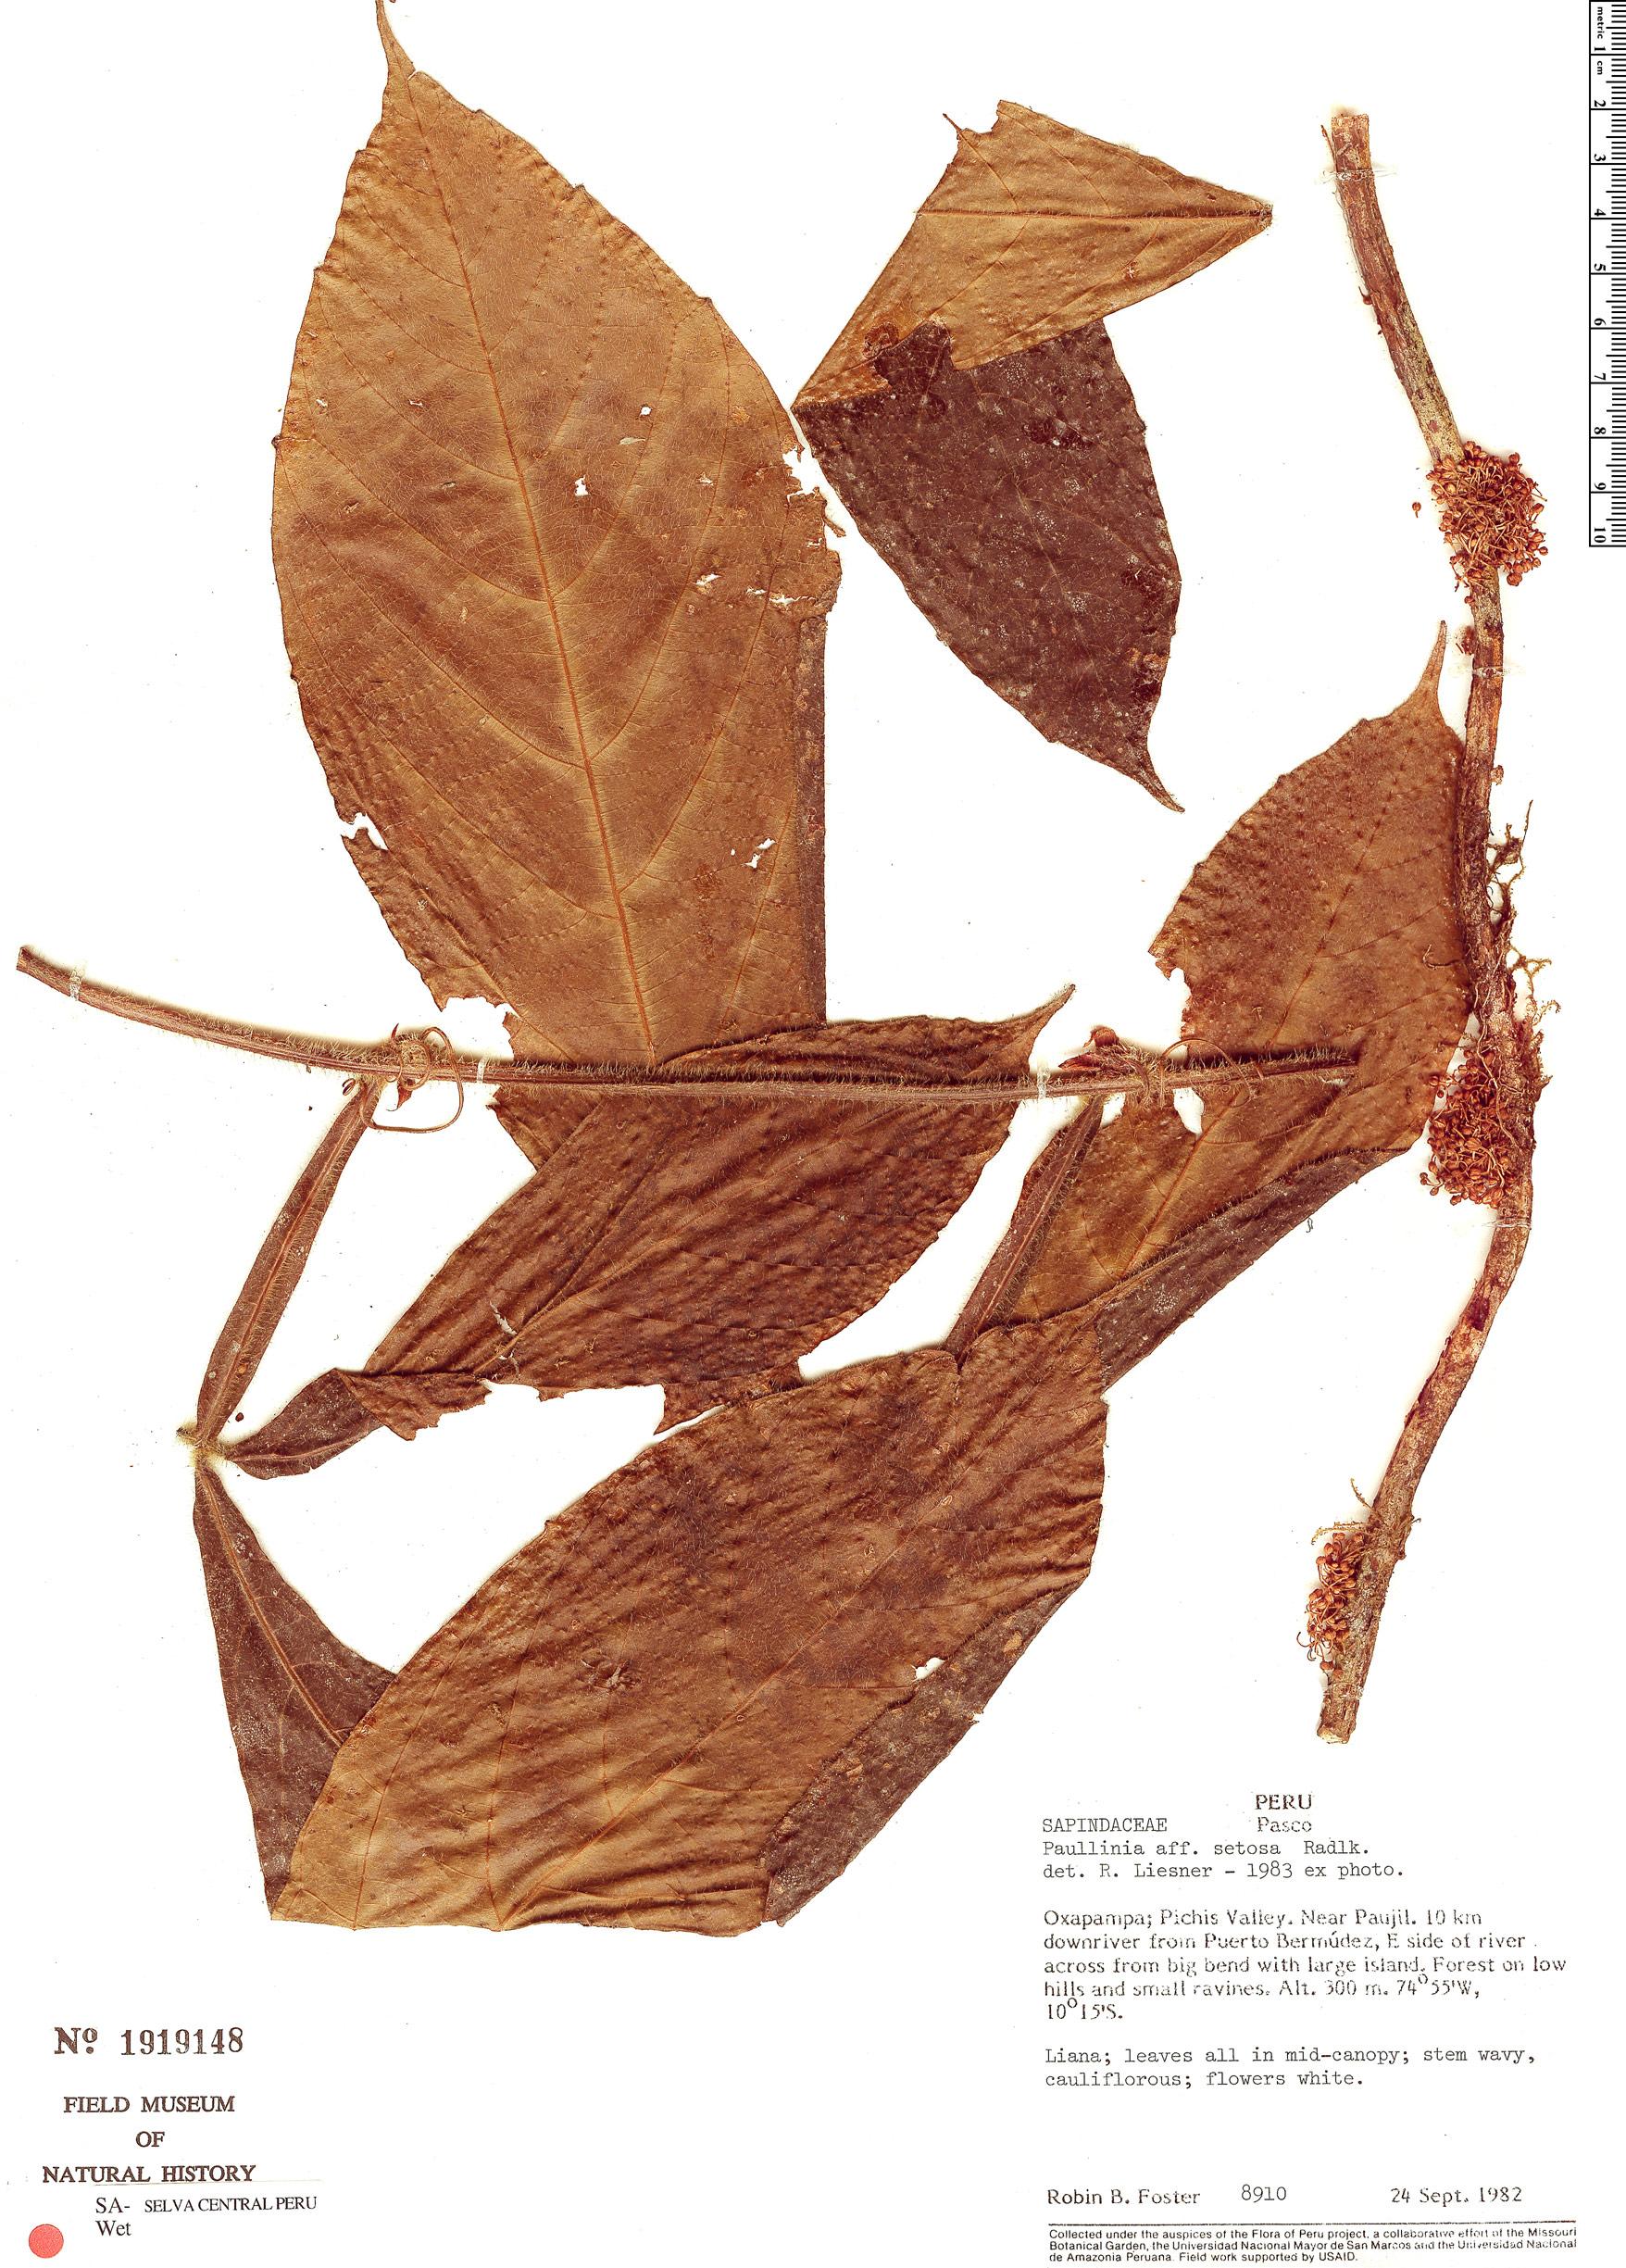 Specimen: Paullinia setosa